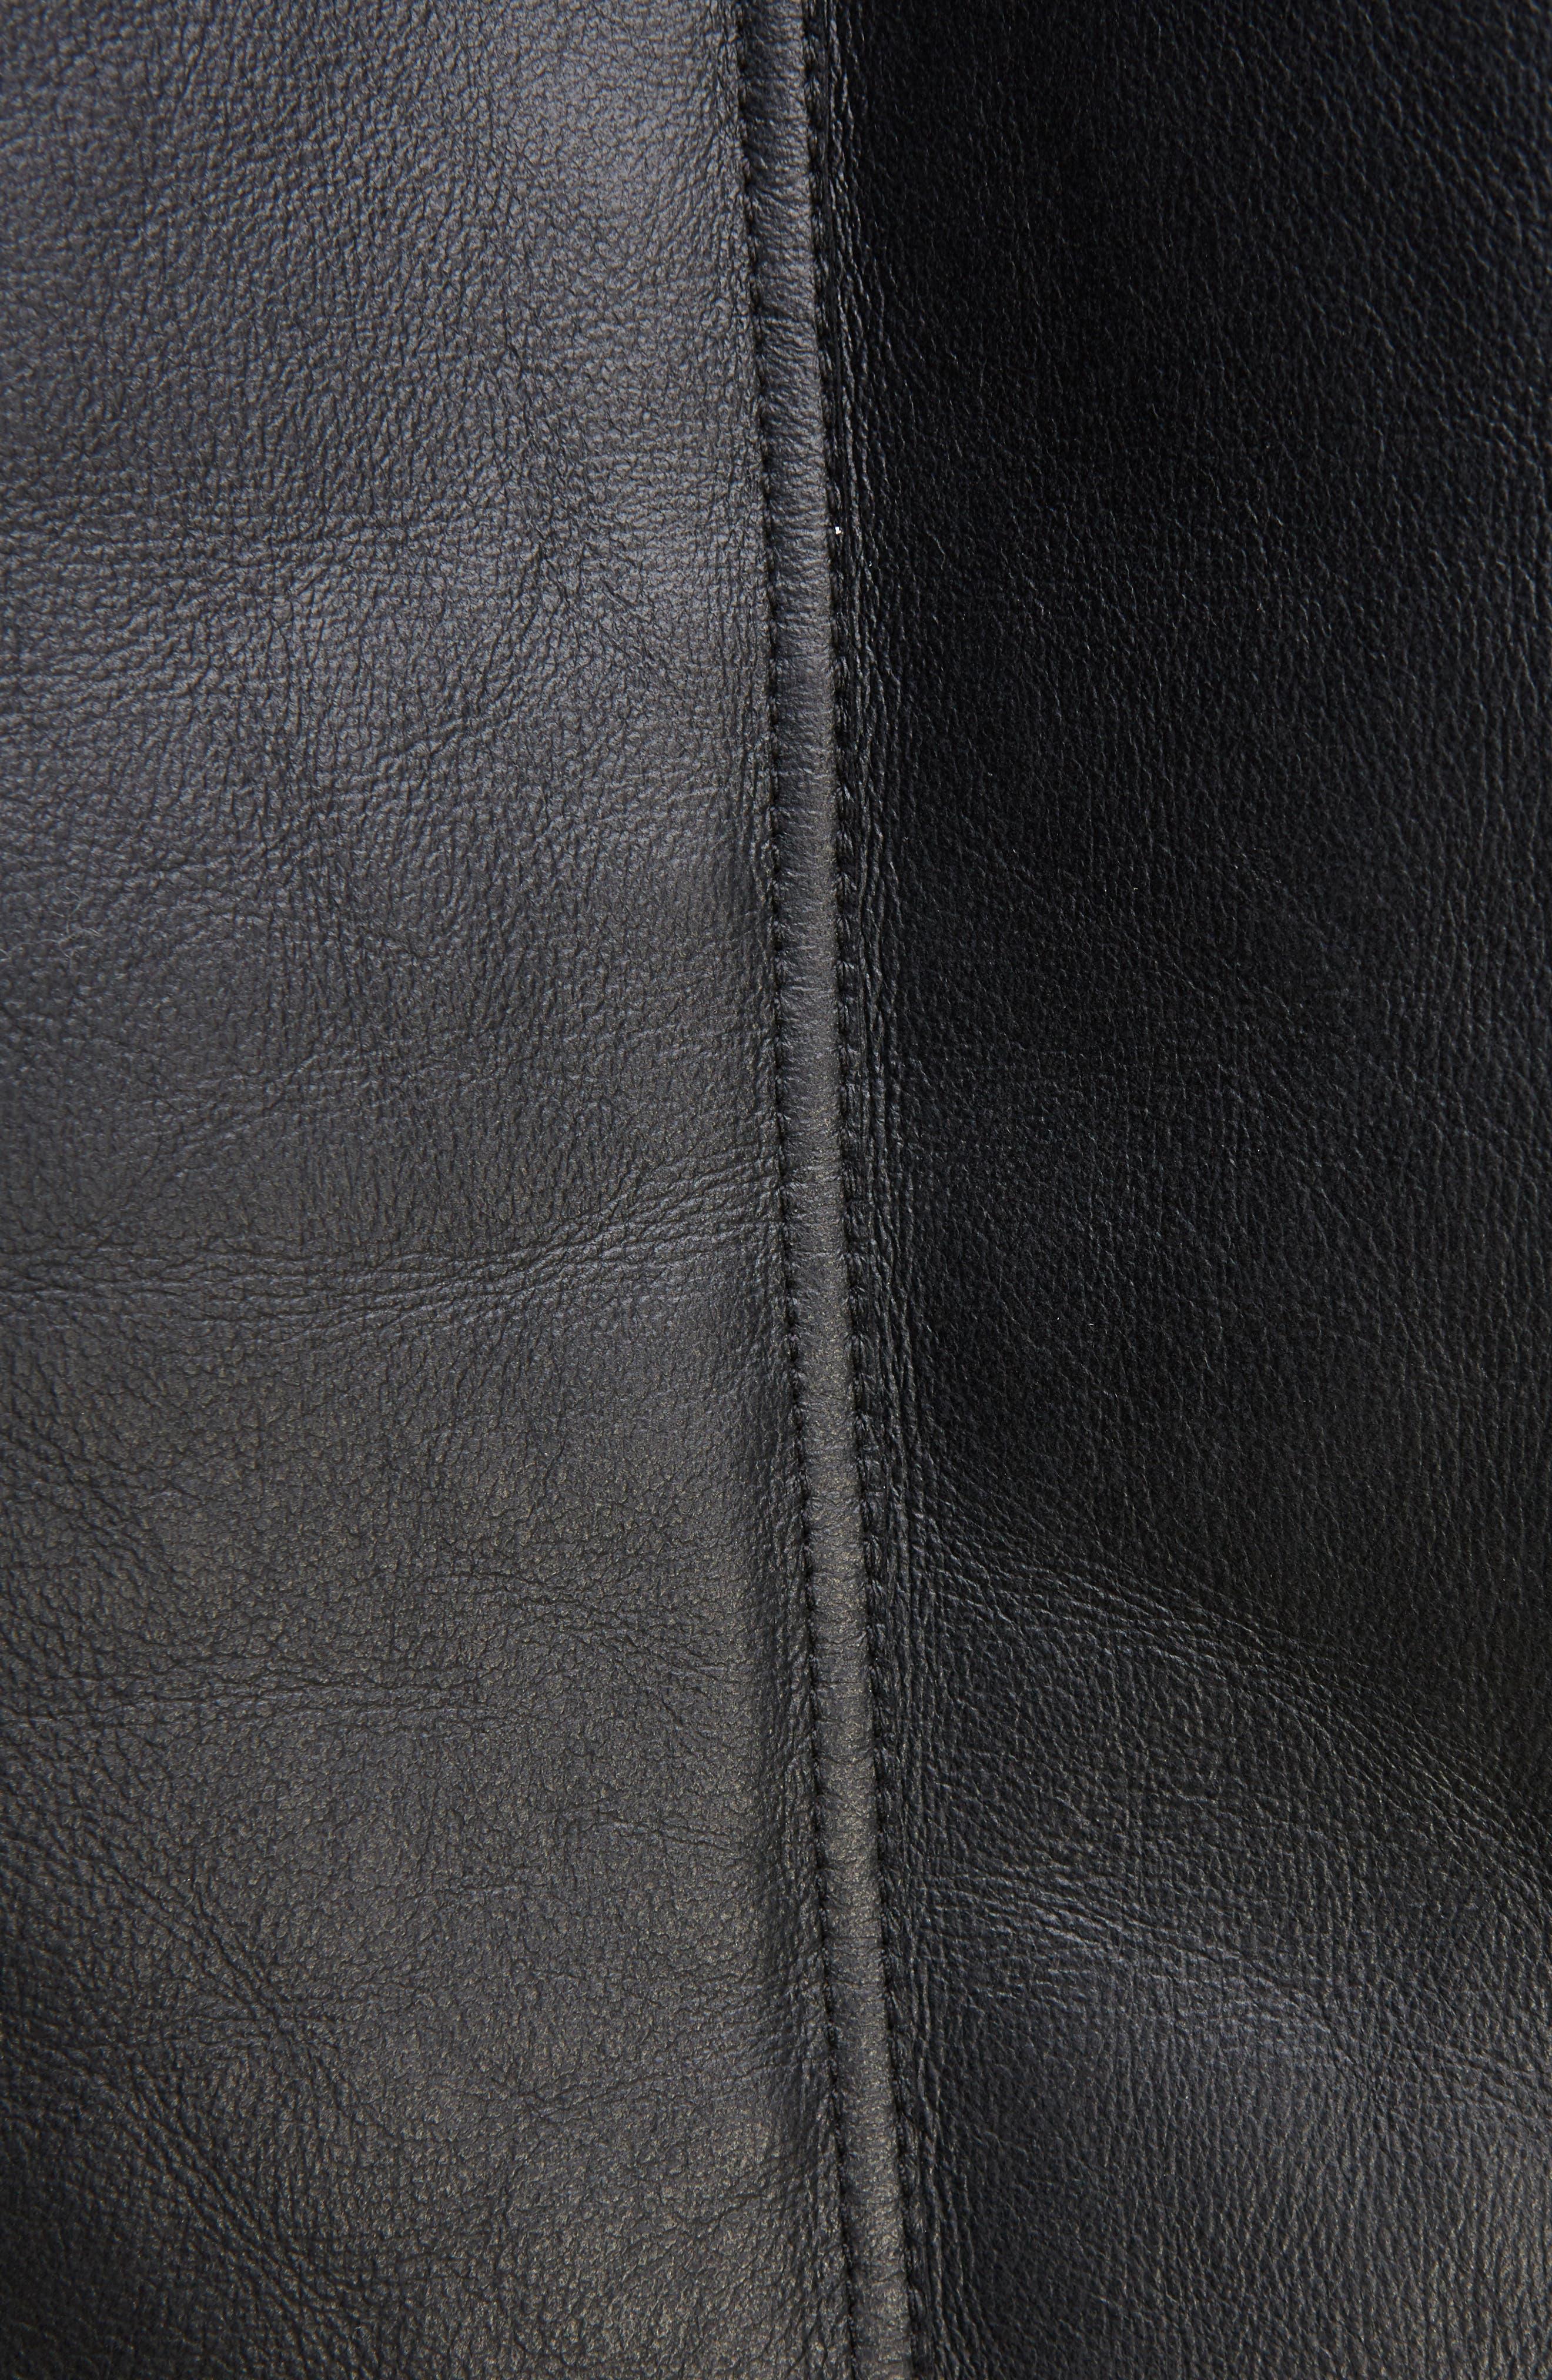 Velocite Genuine Shearling Oversize Moto Jacket,                             Alternate thumbnail 5, color,                             001